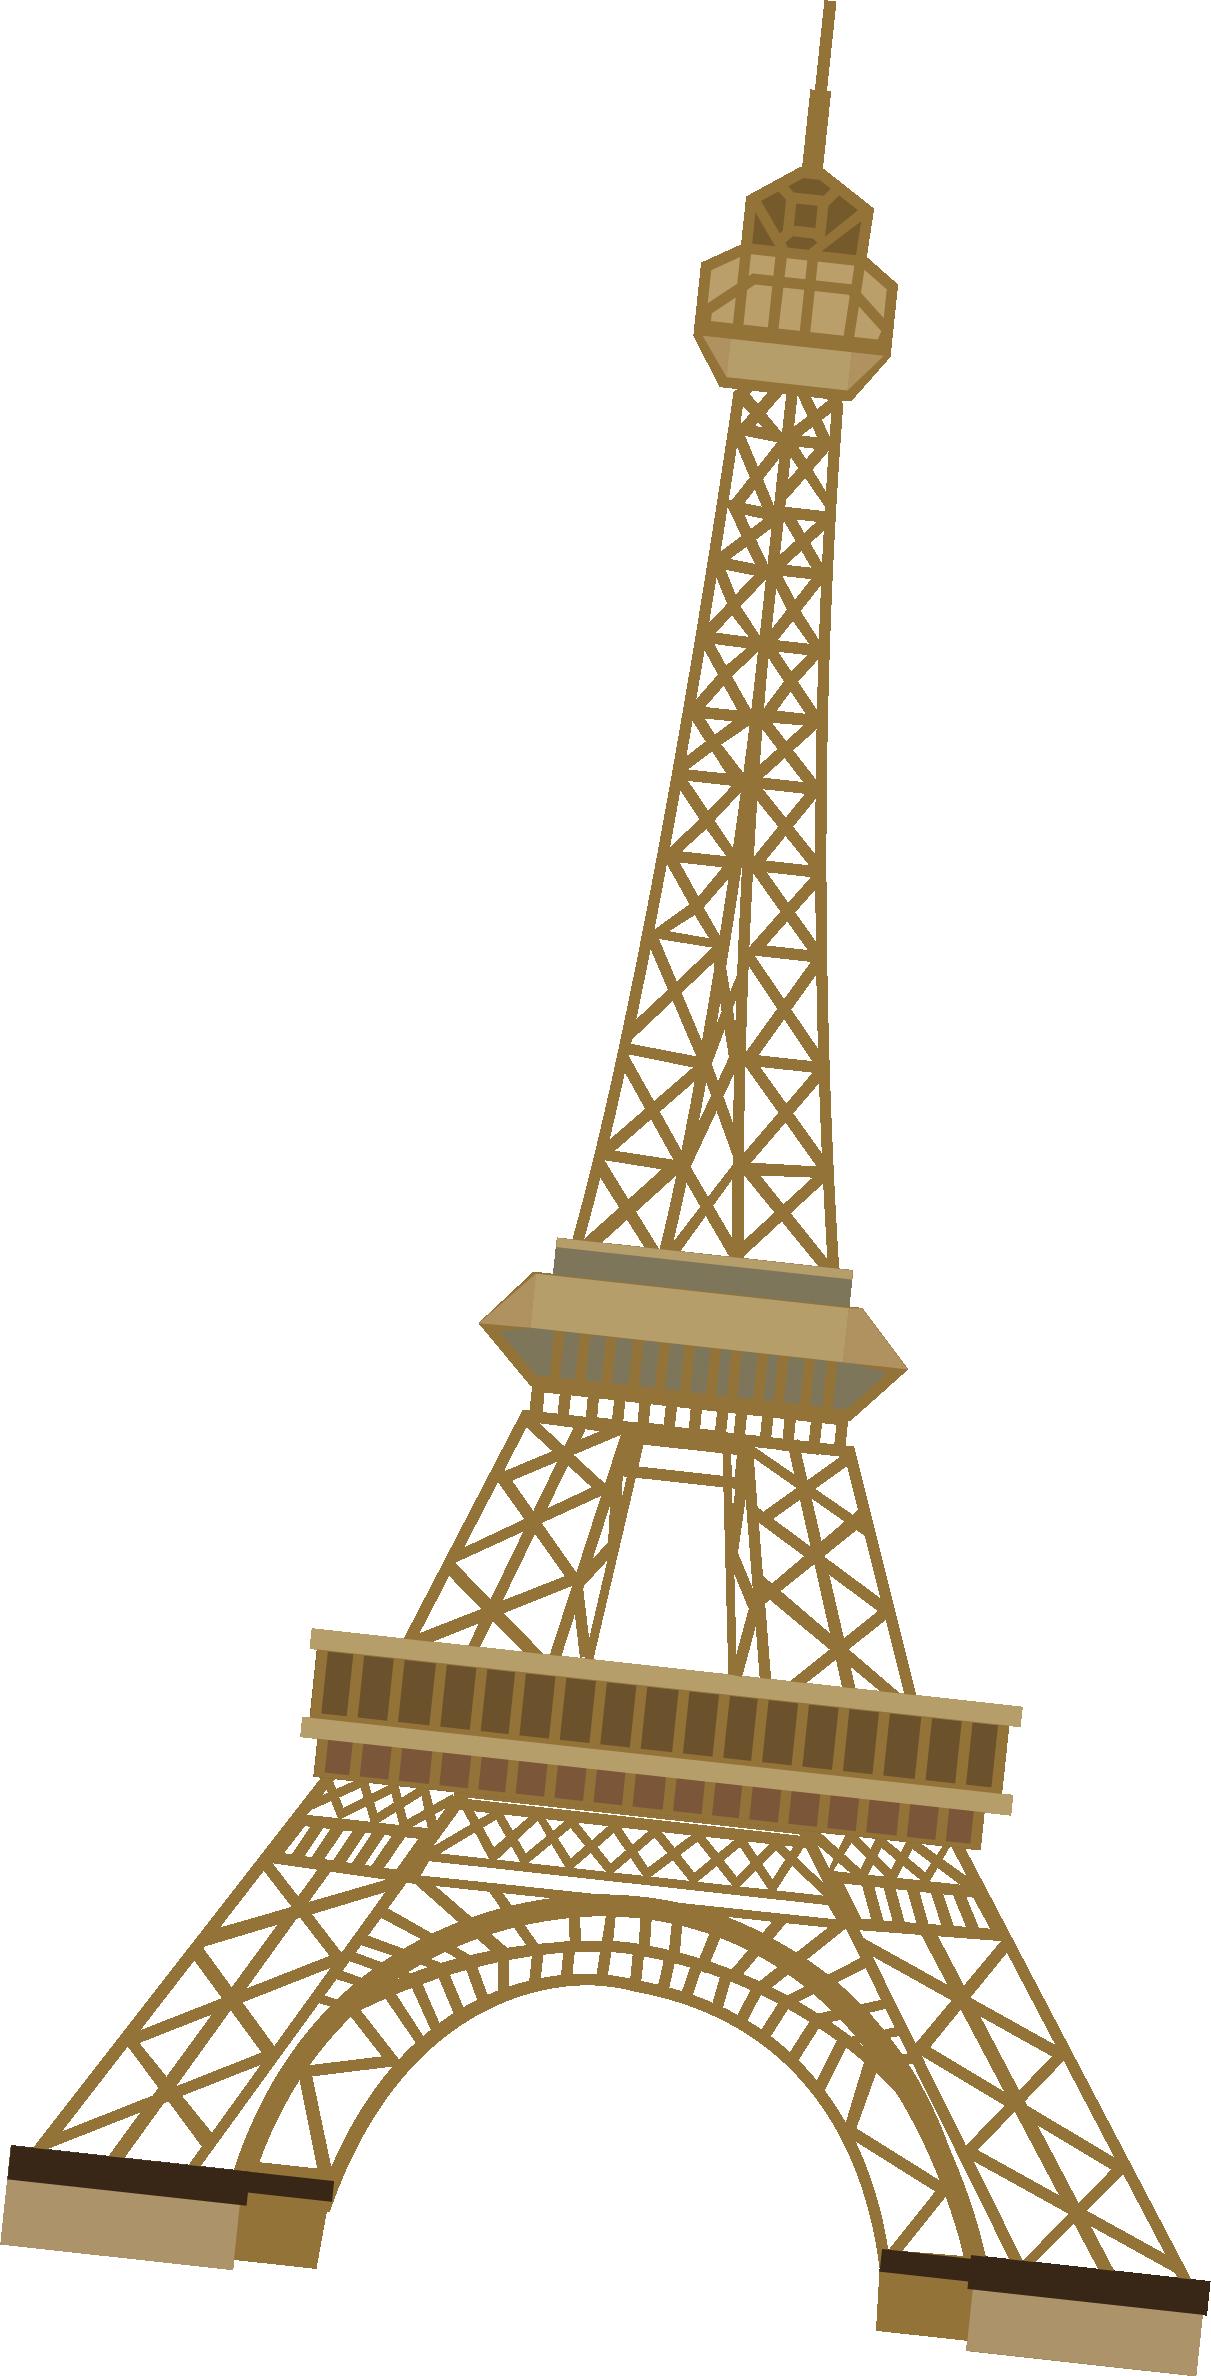 Eiffel Tower Euclidean vector.